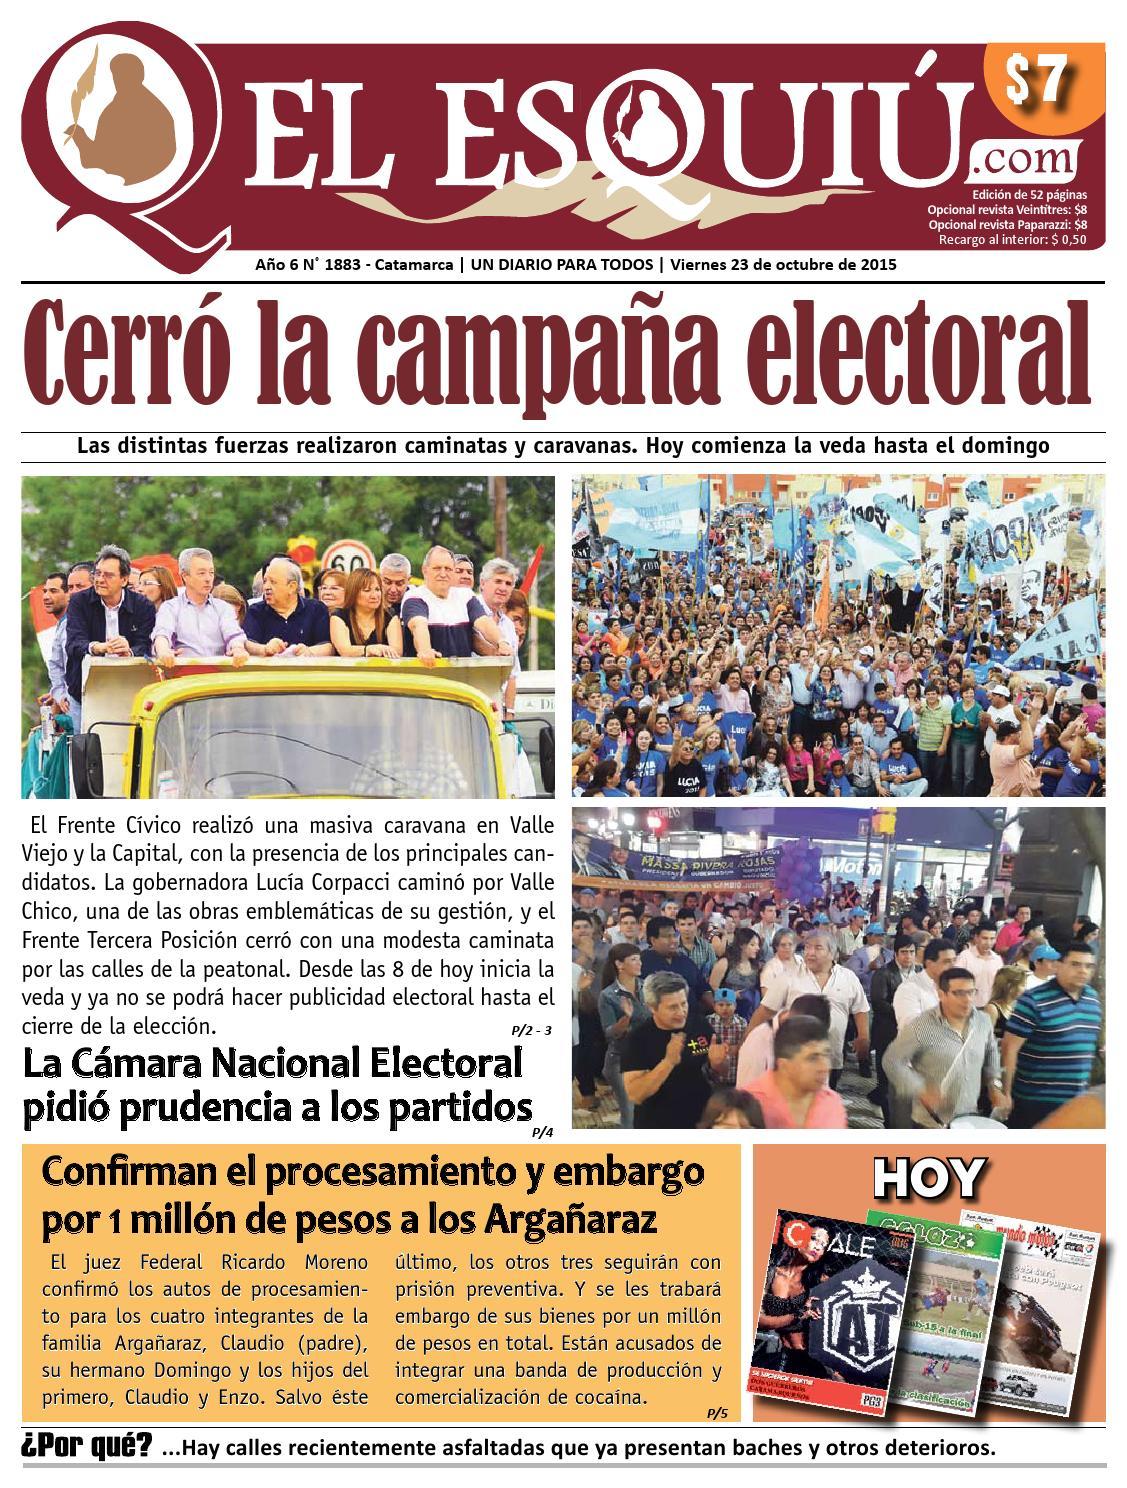 El Esquiu Com Viernes 23 De Octubre De 2015 By Editorial El  # Muebles Juampy Tigre